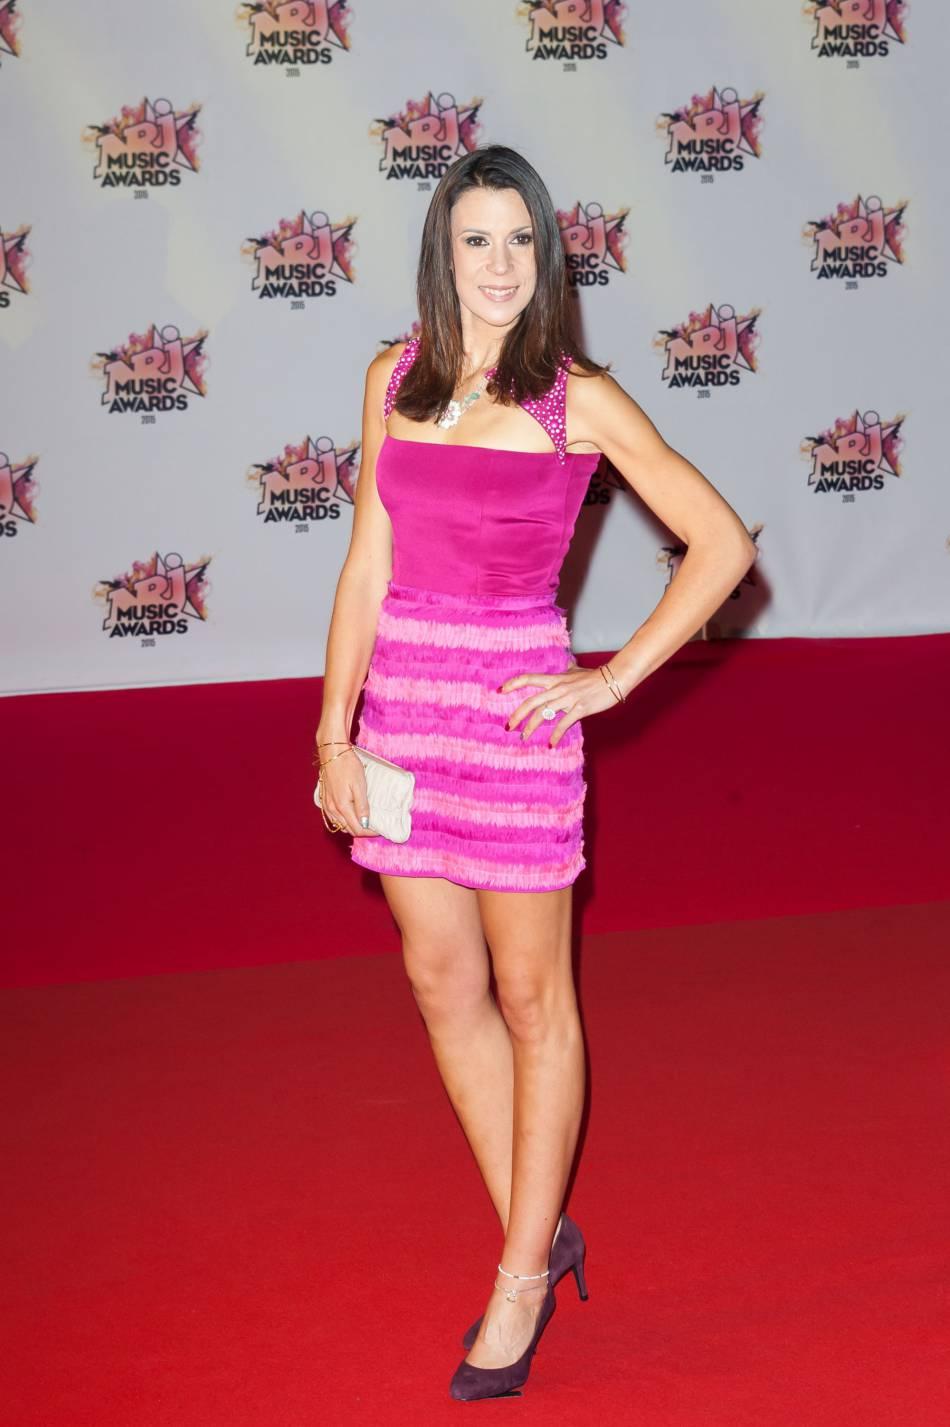 Aux NRJ Music Awards, Marion Bartoli a fait sensation.